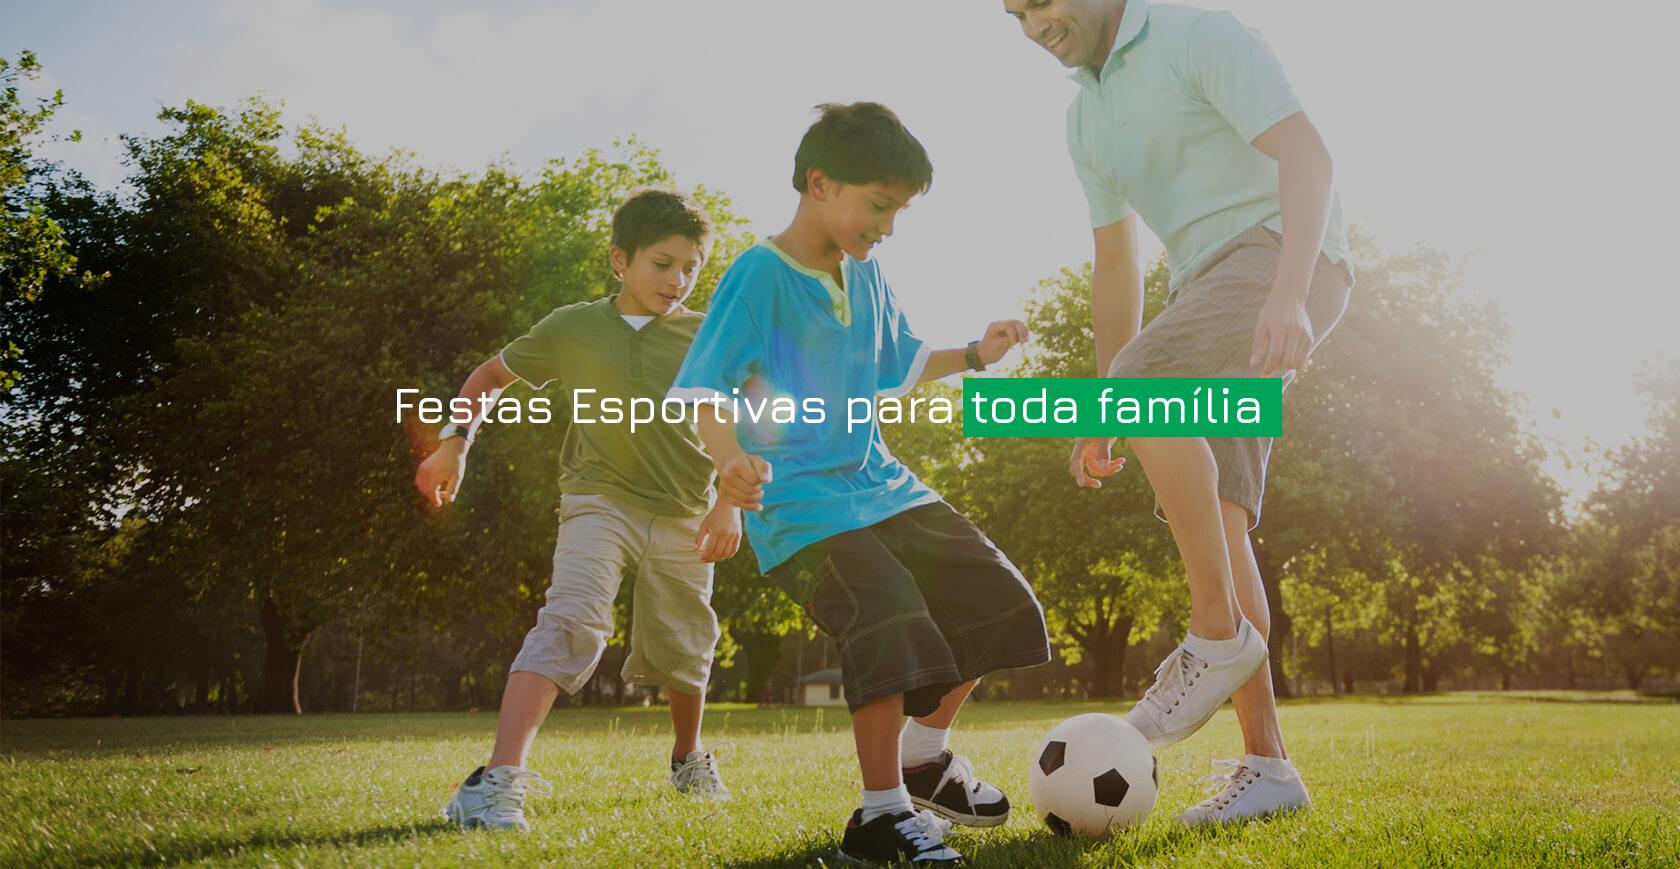 Festas esportivas para toda a família